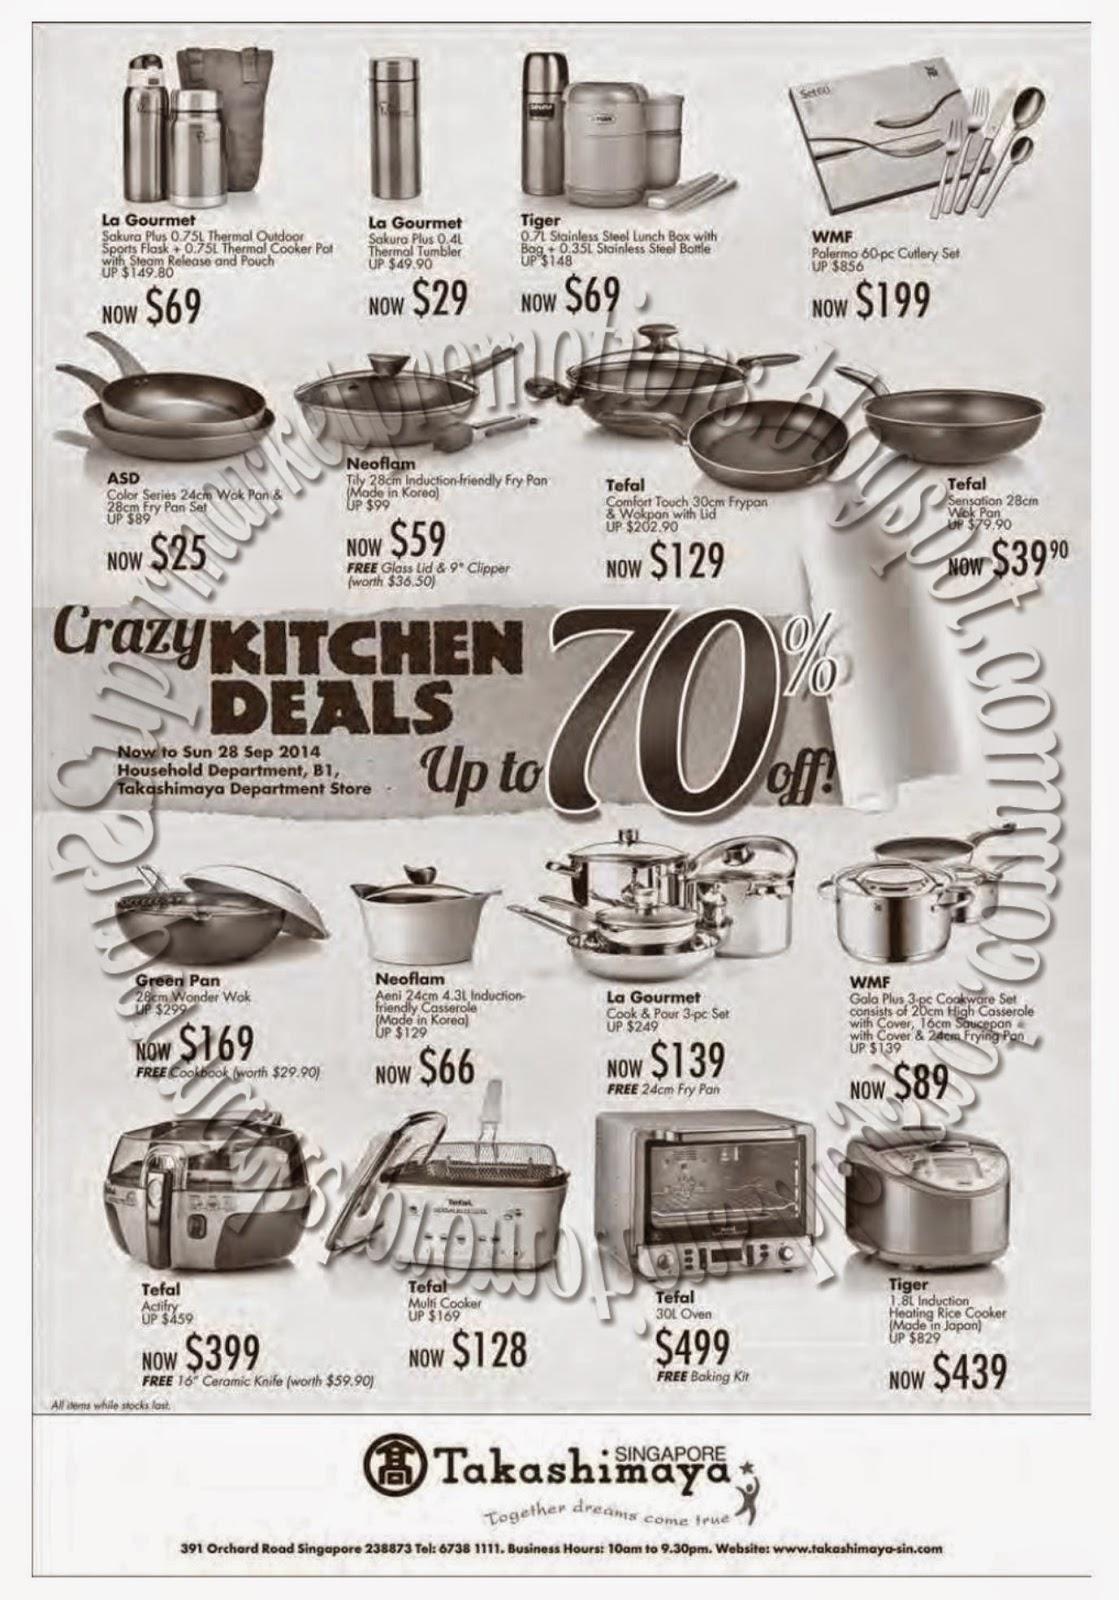 Takashimaya Crazy Kitchen Deals 12 September 2014